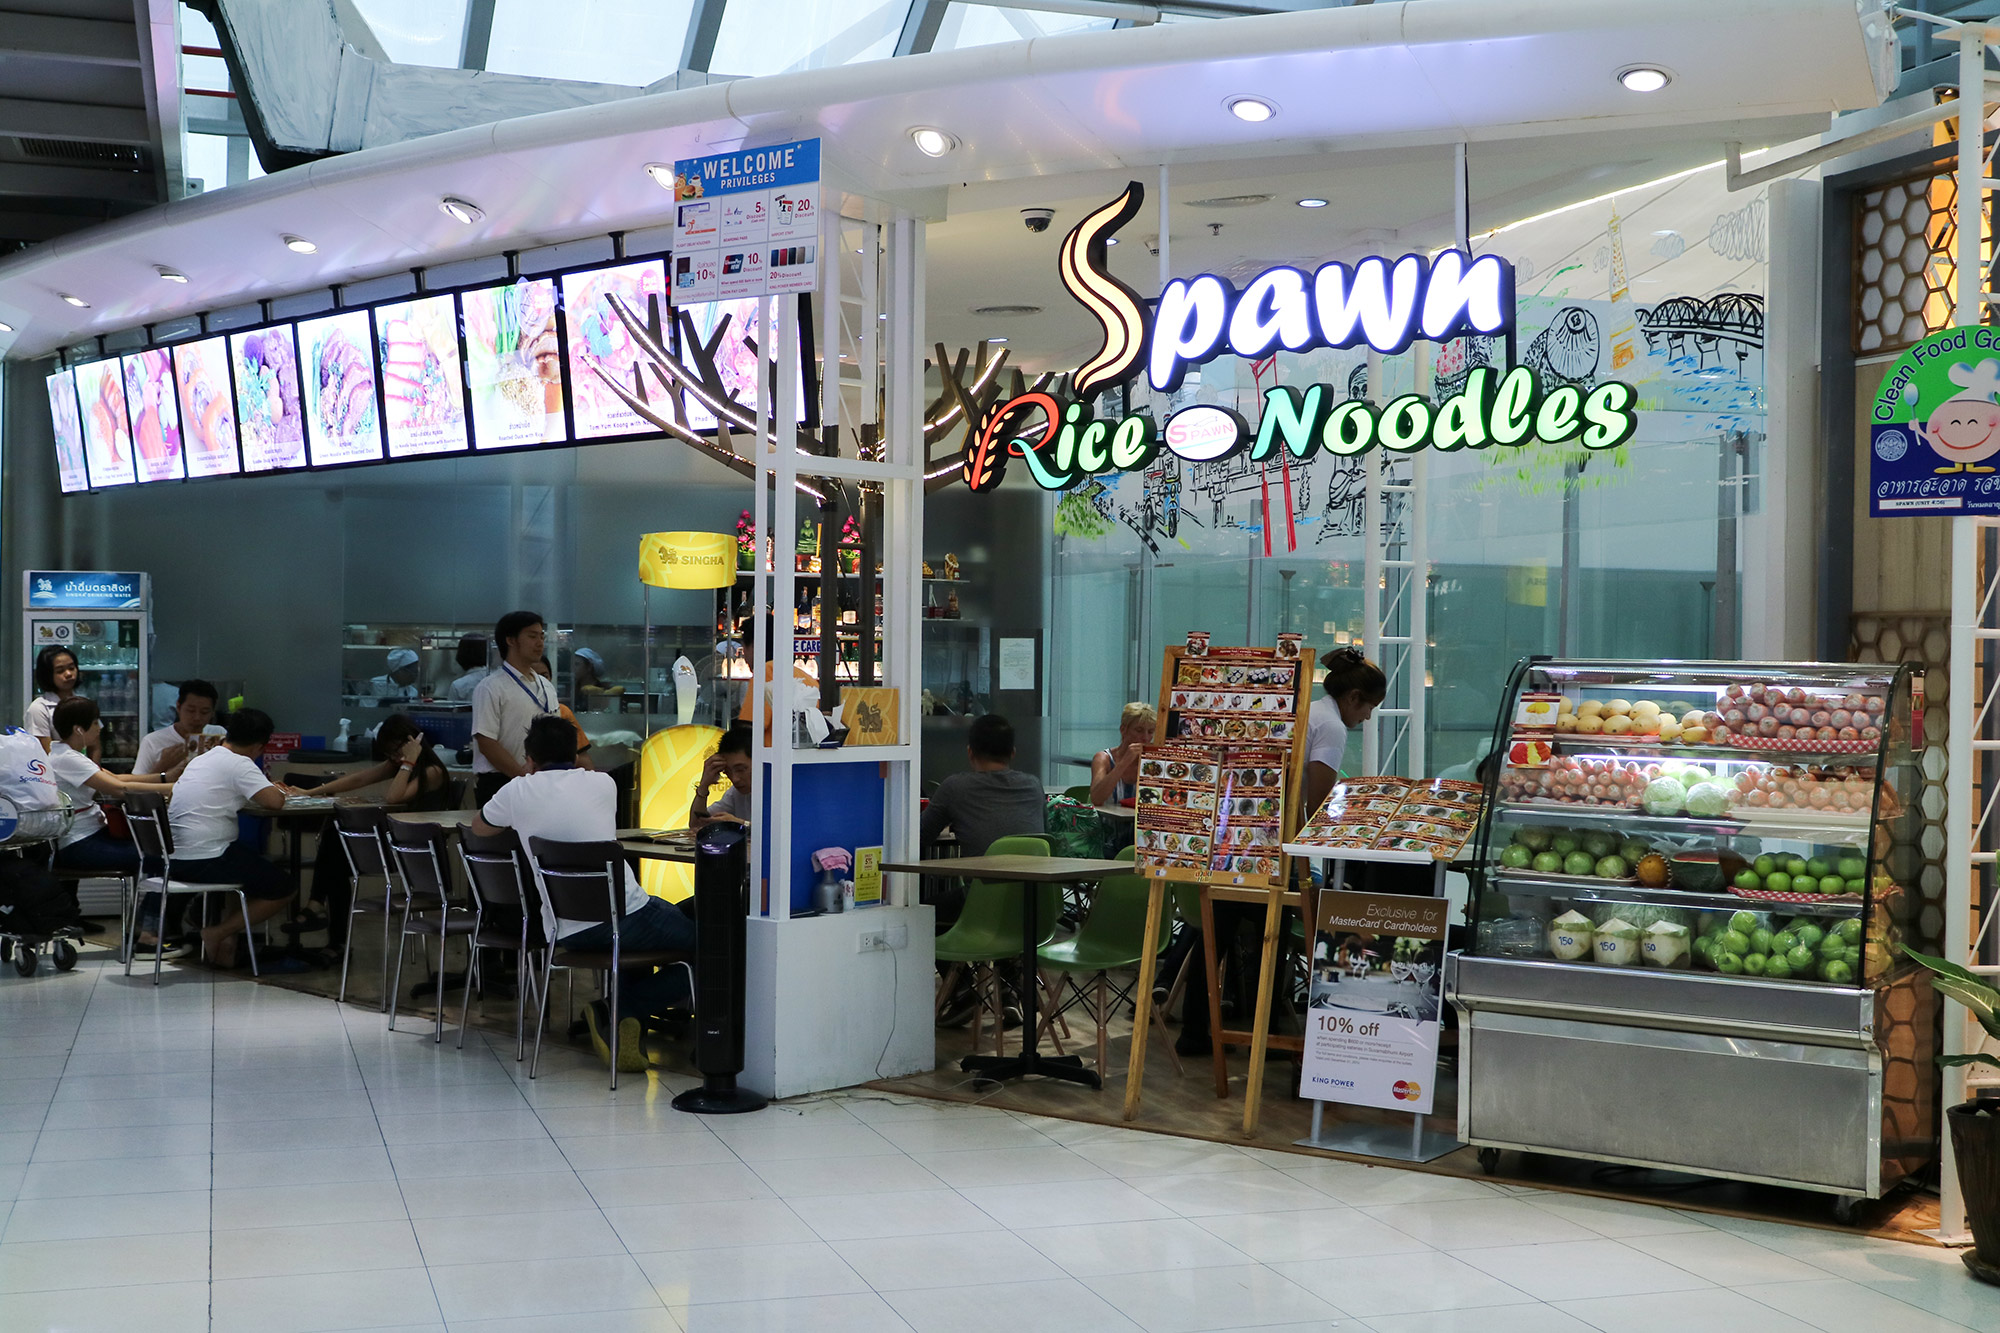 Spawn อาหารไทย-ญี่ปุ่น ท่าอากาศยานสุวรรณภูมิ  Spawn อาหารไทย-ญี่ปุ่น ท่าอากาศยานสุวรรณภูมิ IMG 1472